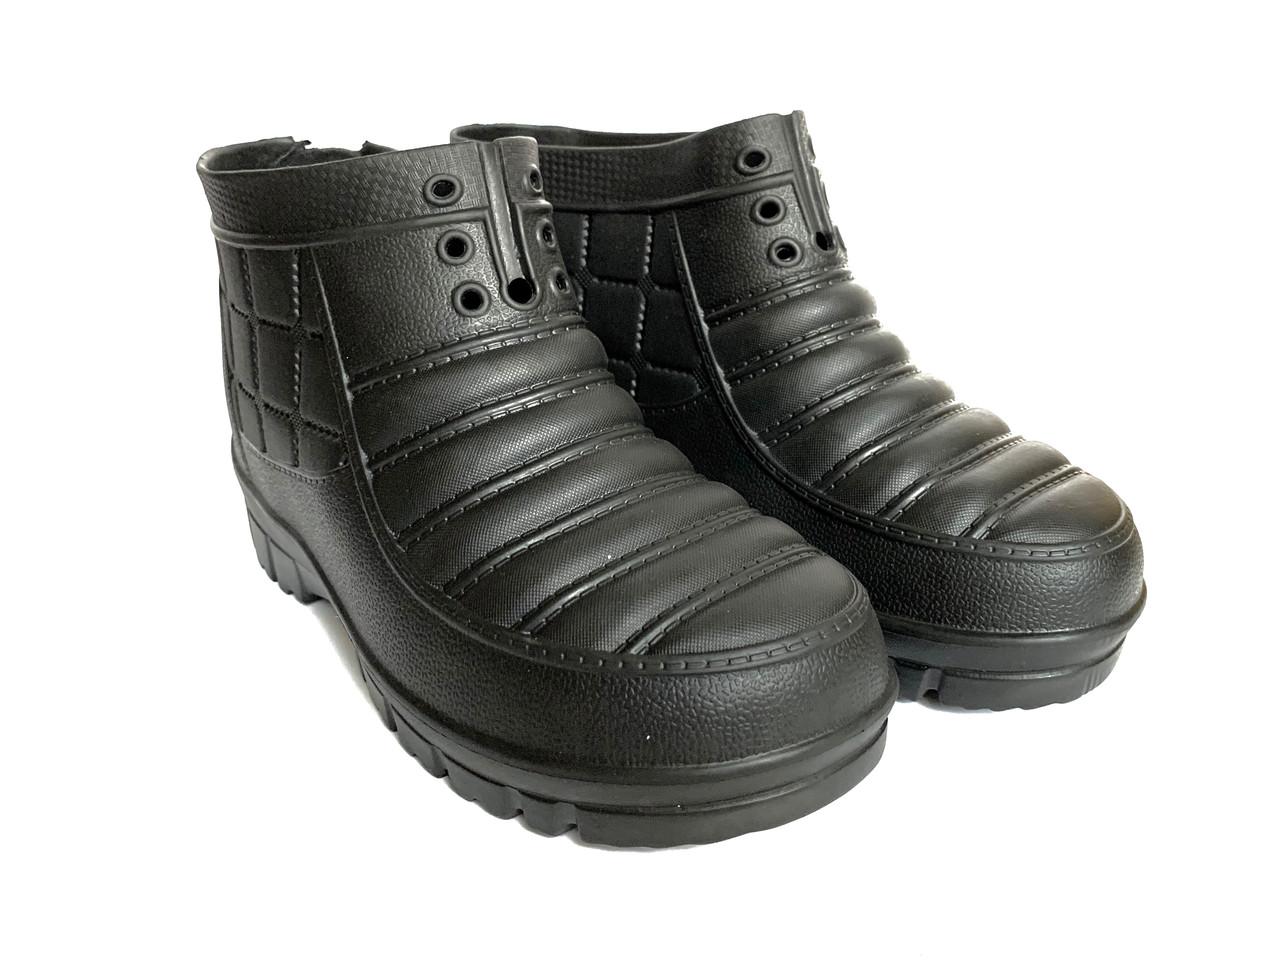 Мужские галоши 42-43р, галоши пена, мужская обувь EVA ЭВА из пенки, галоші, садові галоші